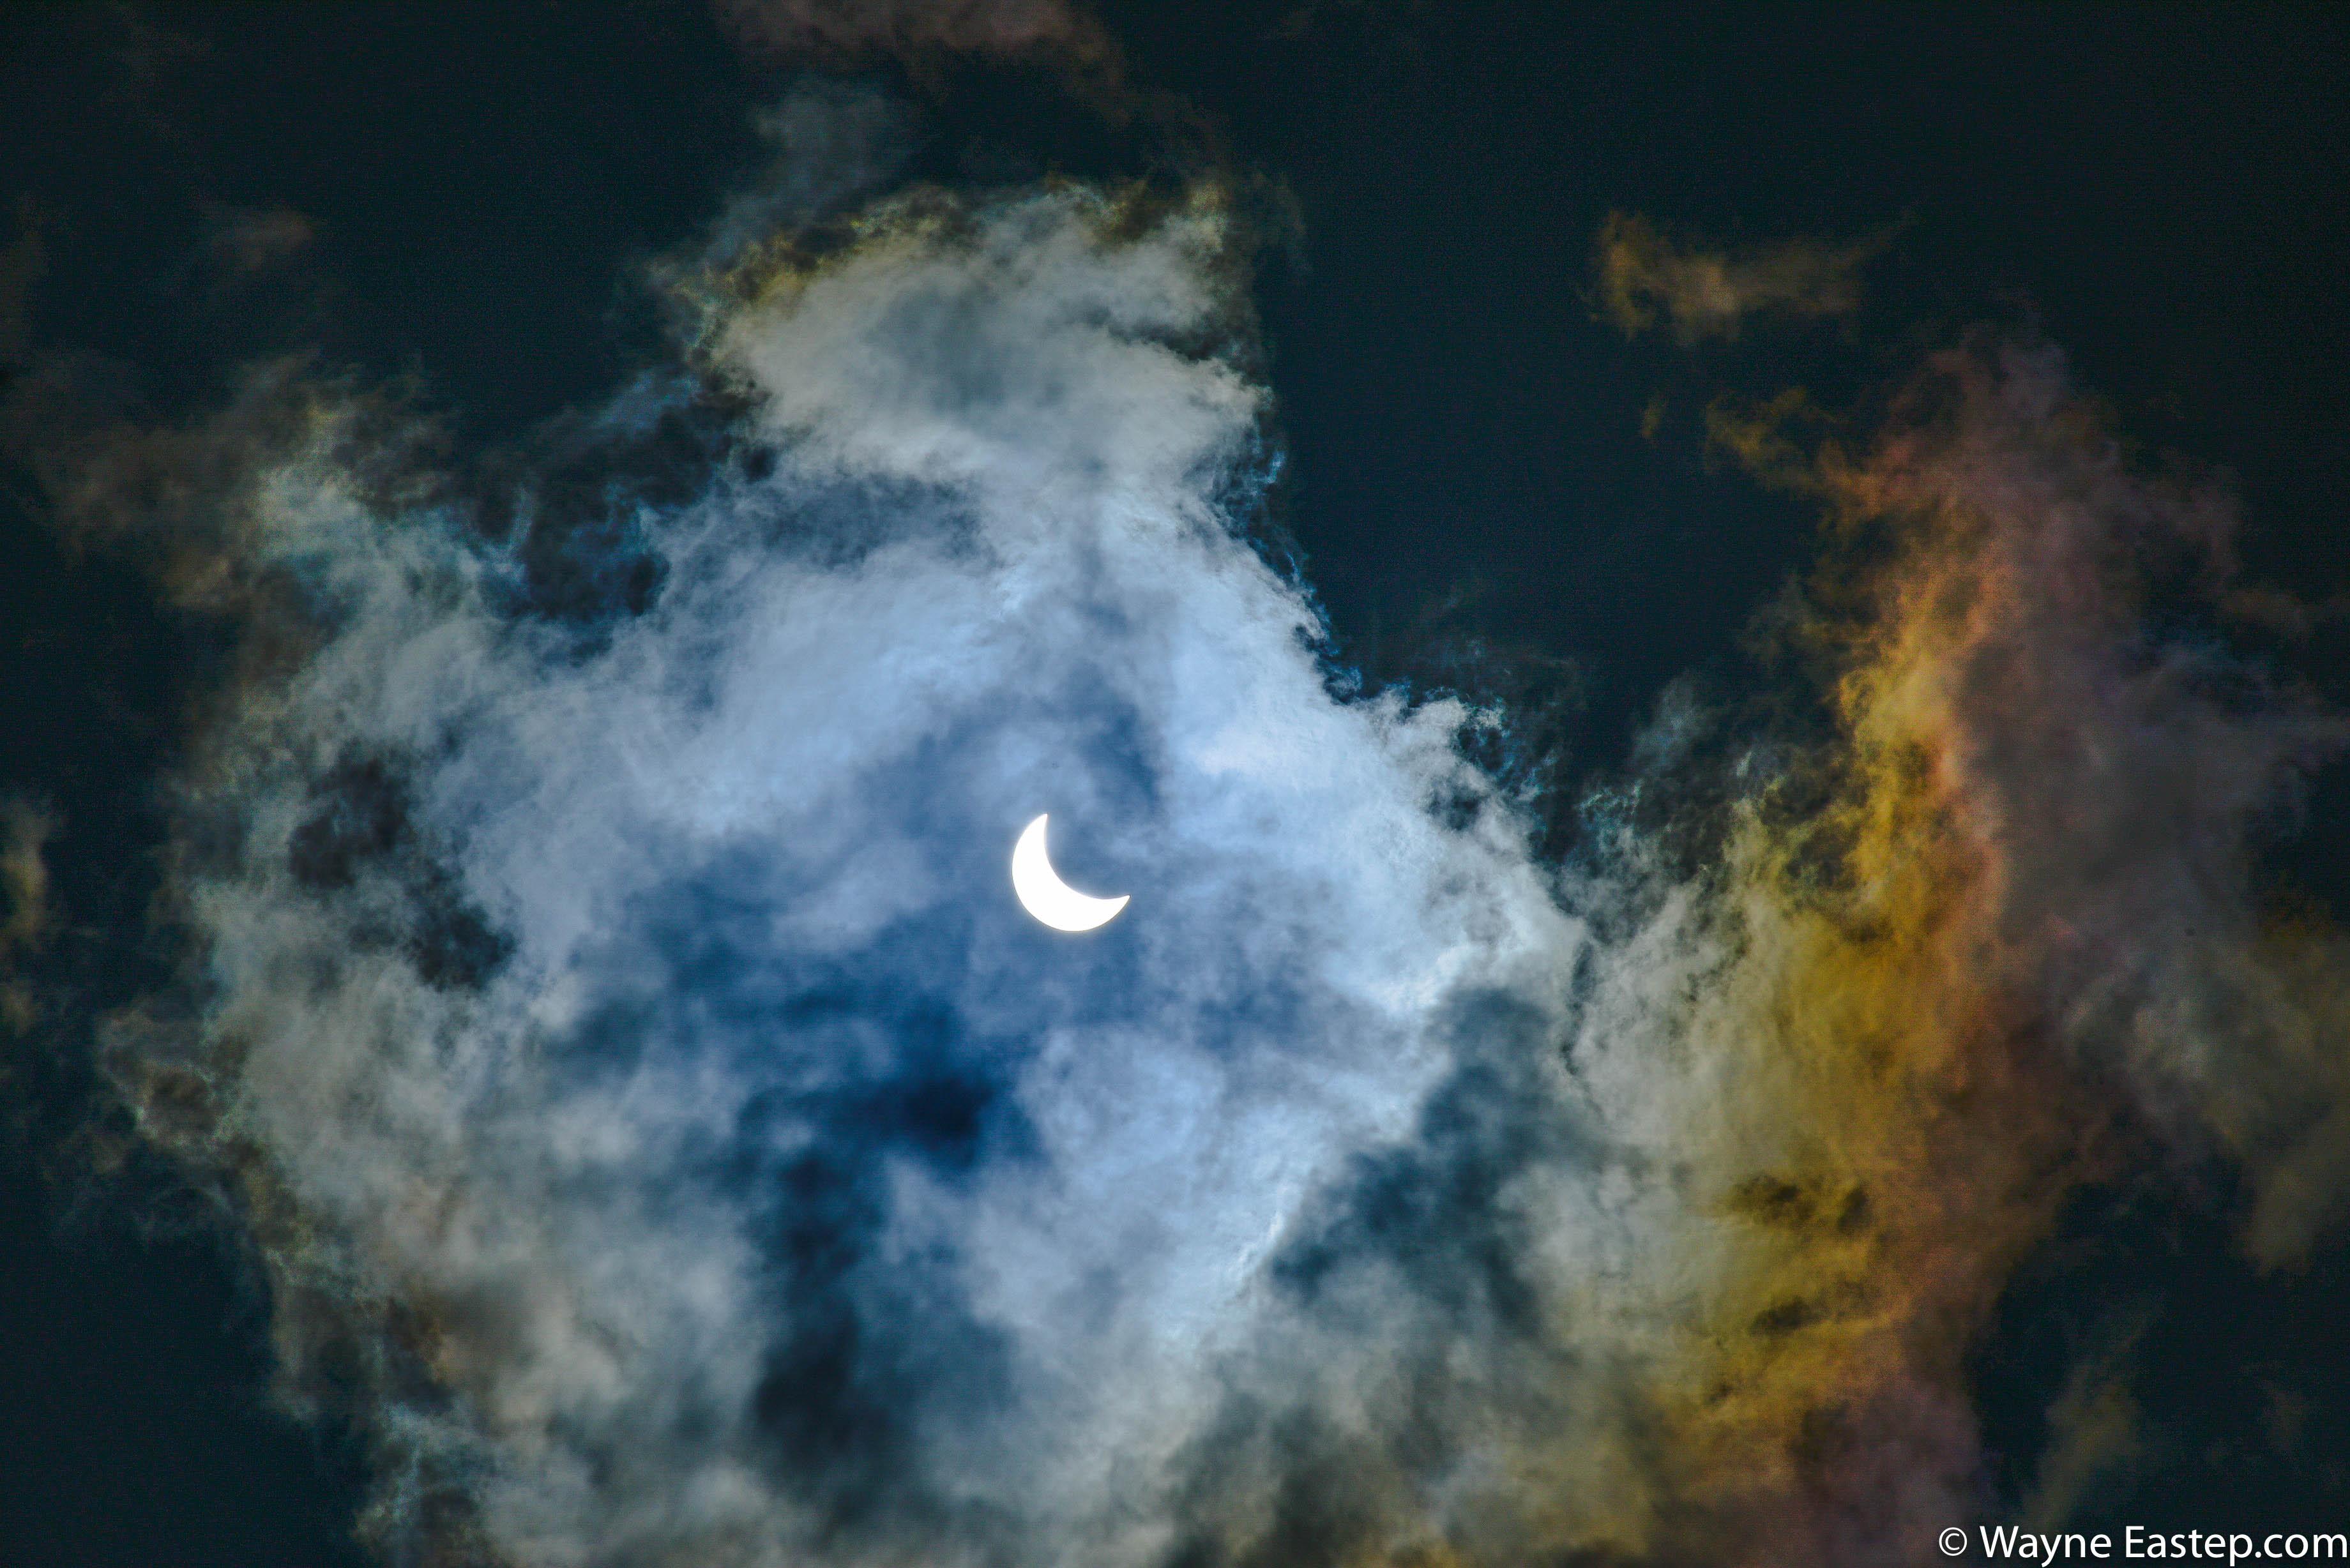 #WayneEastep #photogapher #photography #images #photos nature photography # #2017Solar Eclipse #ArtforInteriors, #ArtSpecifier #Photographs*#color #DisplayArt #Eclipse* #Florida #Graphicimage, #InteriorDesign #moon #Nature #photo #photograph #picture #Print, #Sarasota #SolarEclipse* #sun, #WallArt